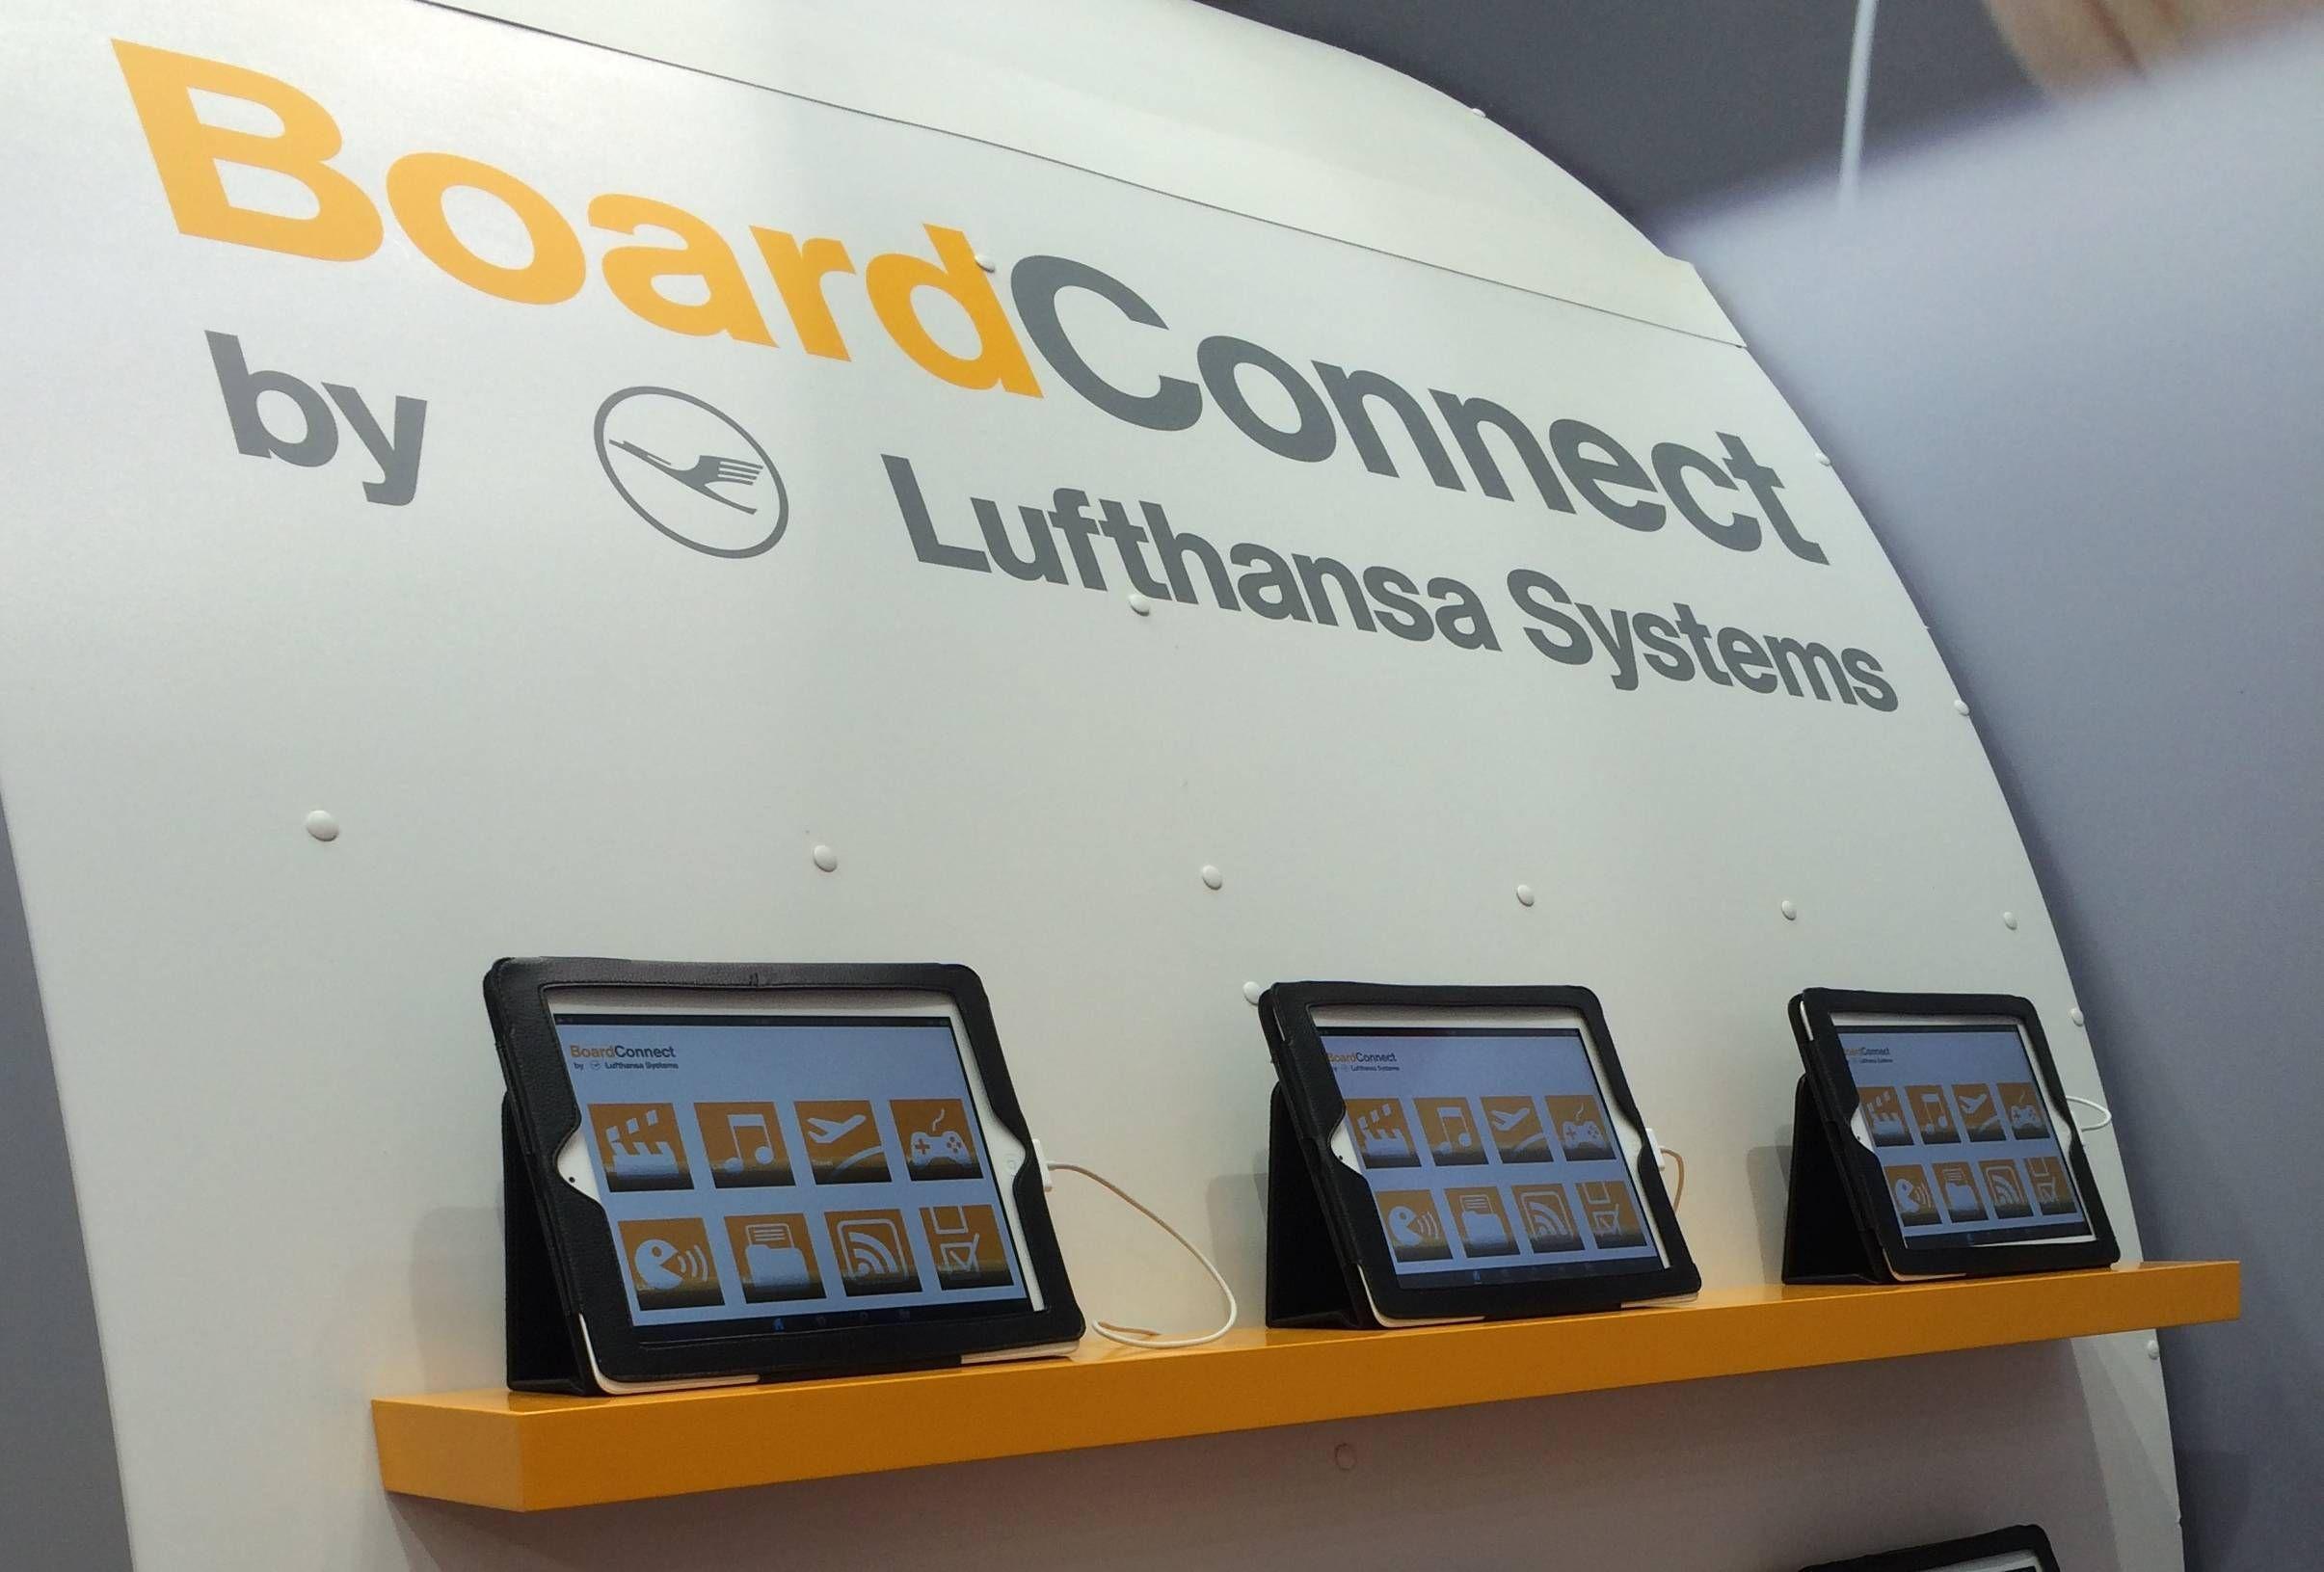 lufthansa board connect